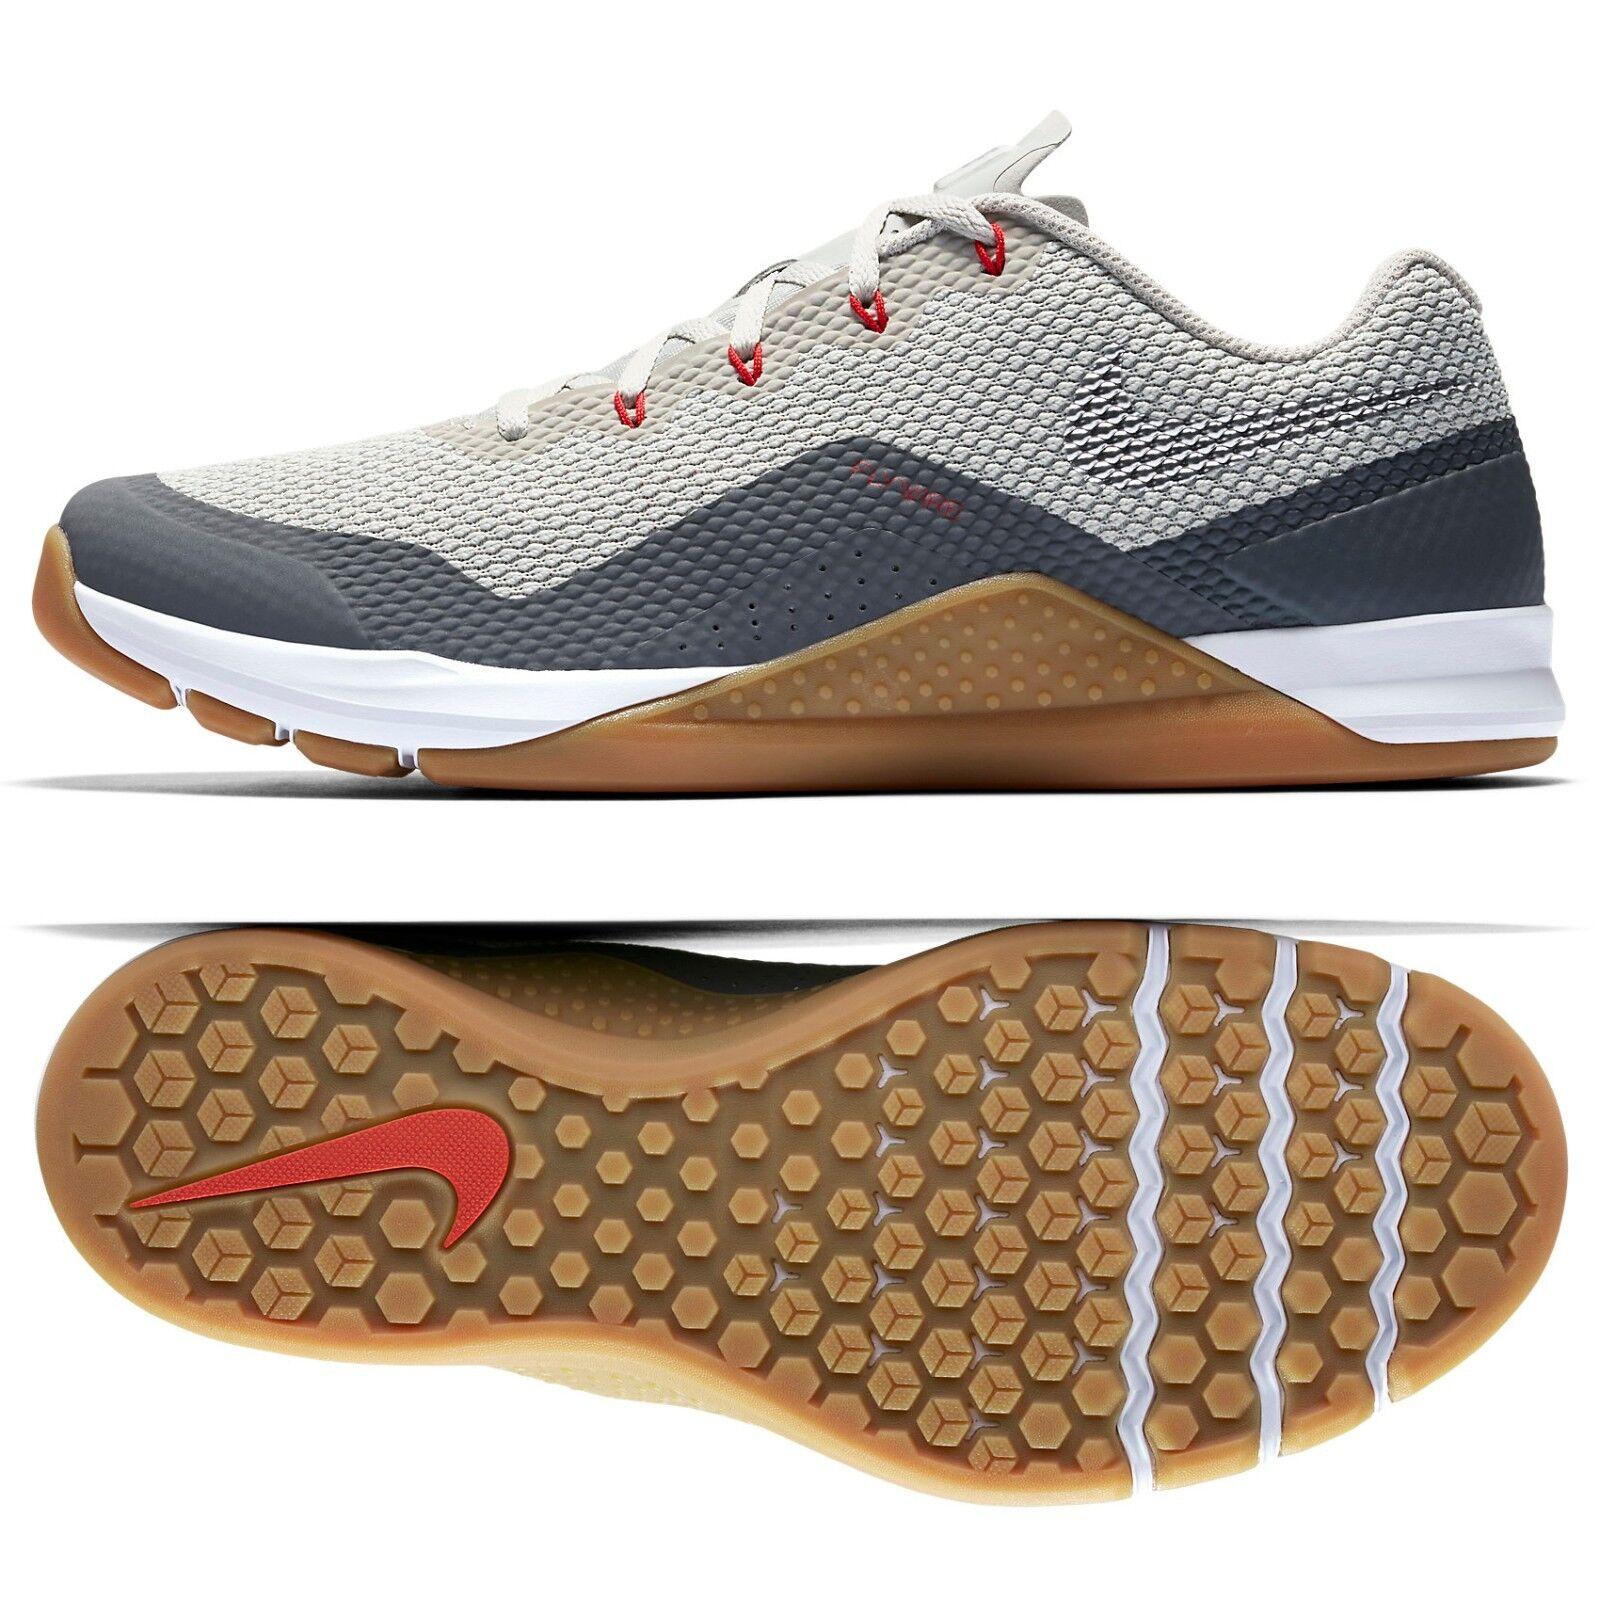 Nike Metcon Repper DSX 898048-005 Pale Grey/Gum Men's Training Shoes Sz 10 The latest discount shoes for men and women